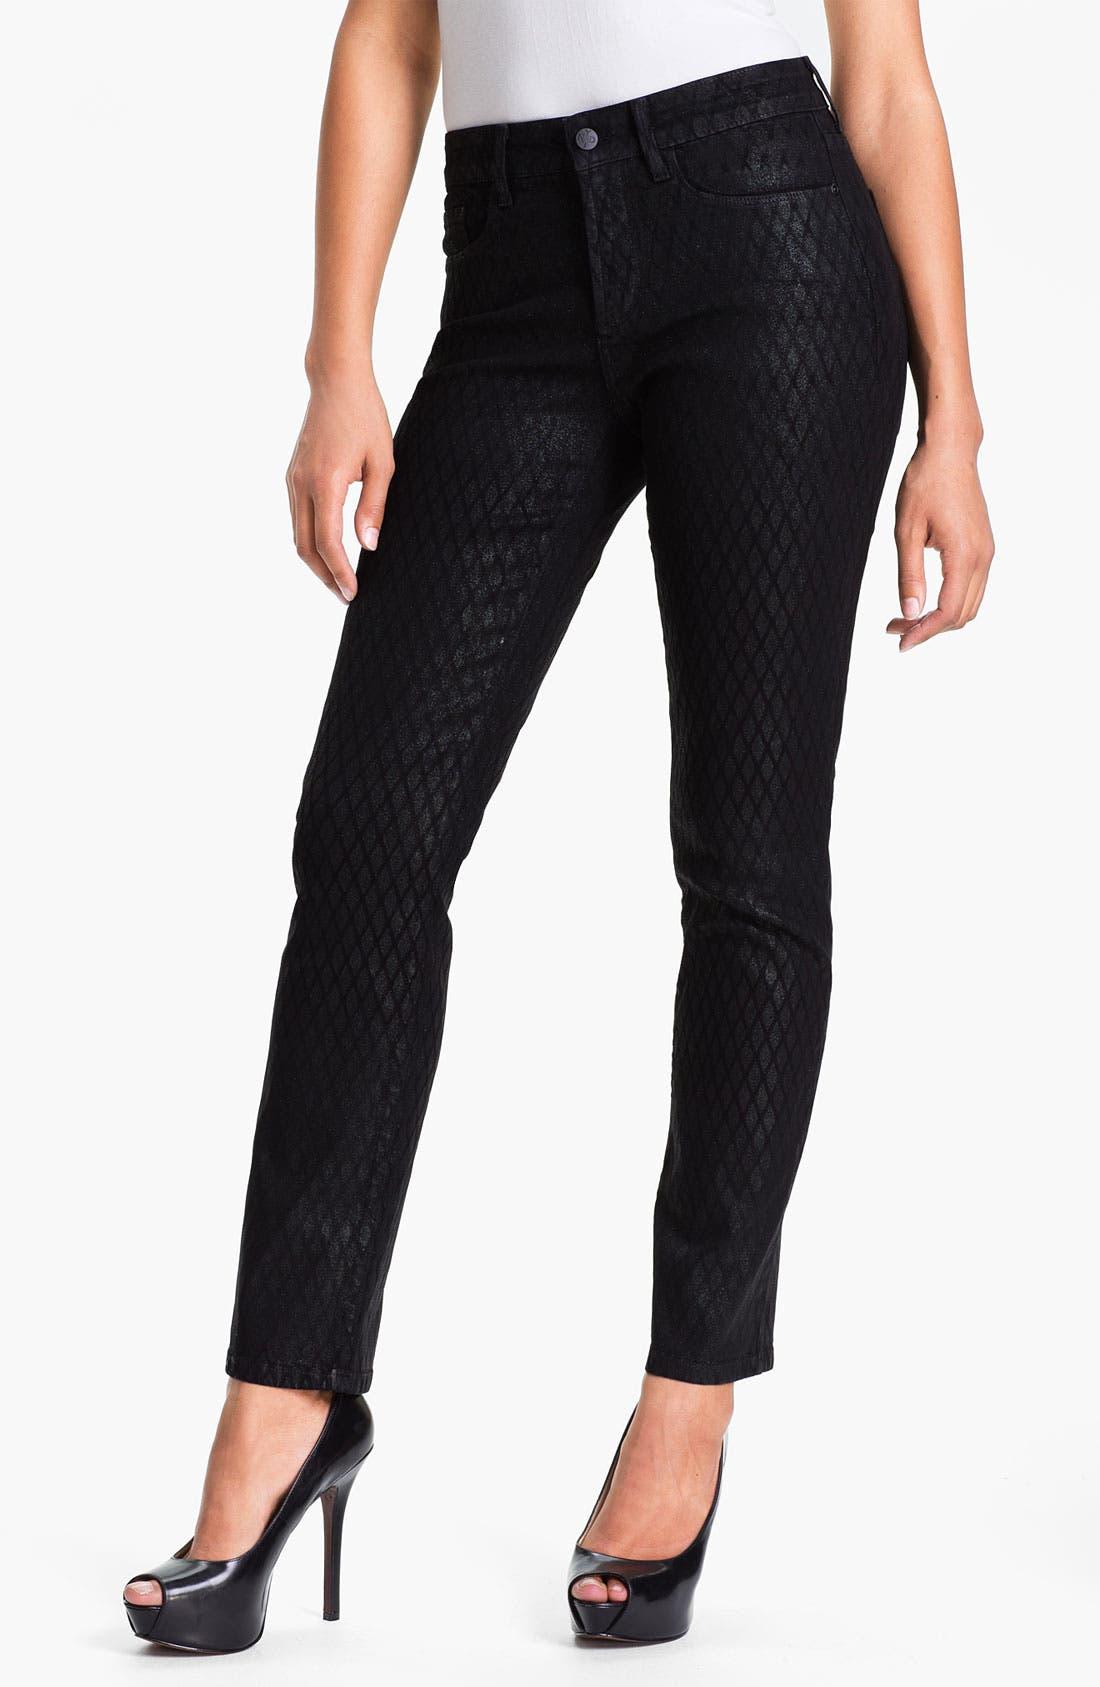 Main Image - NYDJ 'Sheri' Geometric Glitter Coated Skinny Stretch Jeans